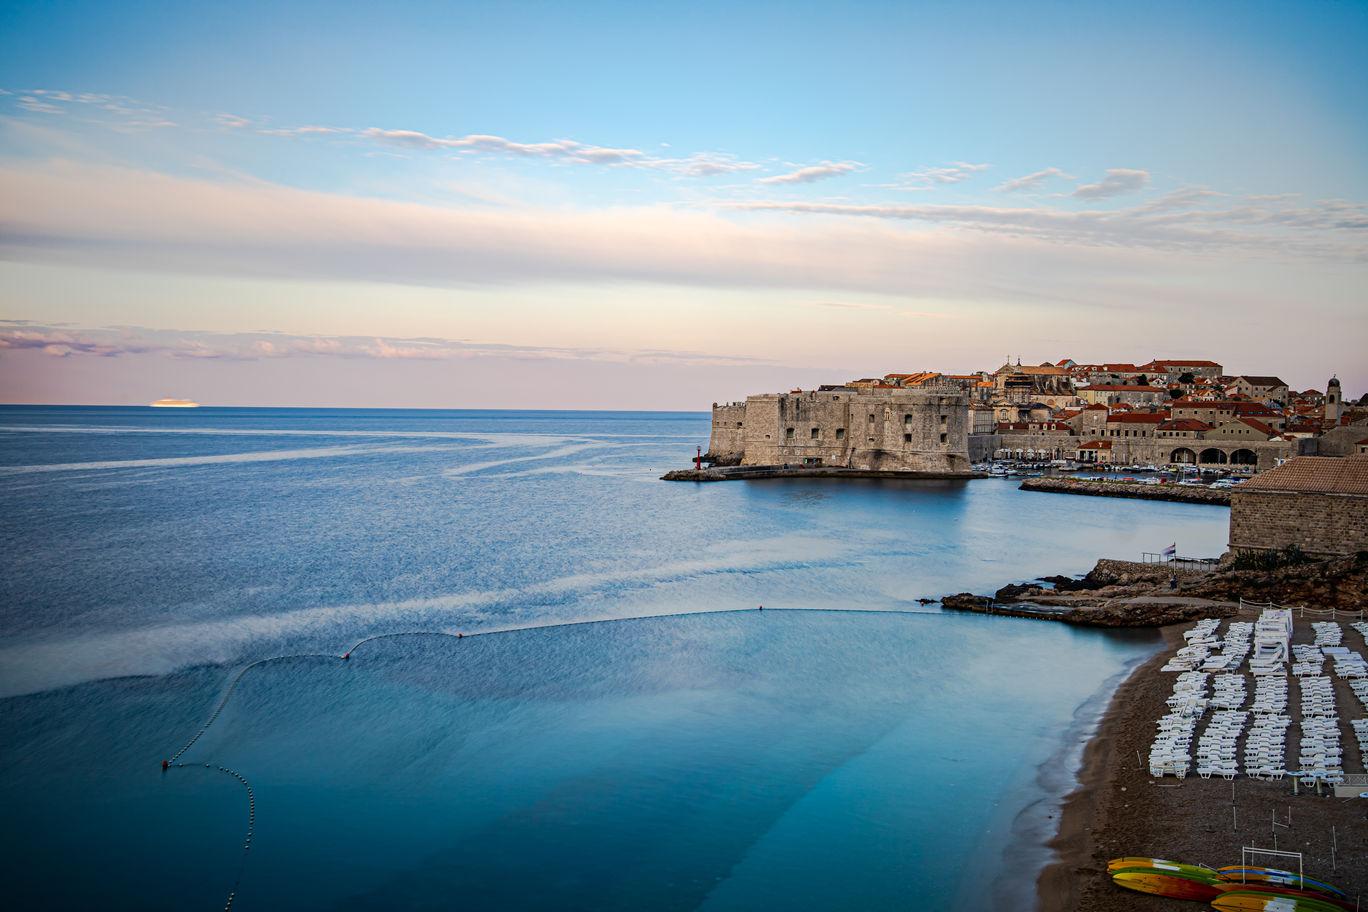 Photo of Croatia By Sugandha Ranjan